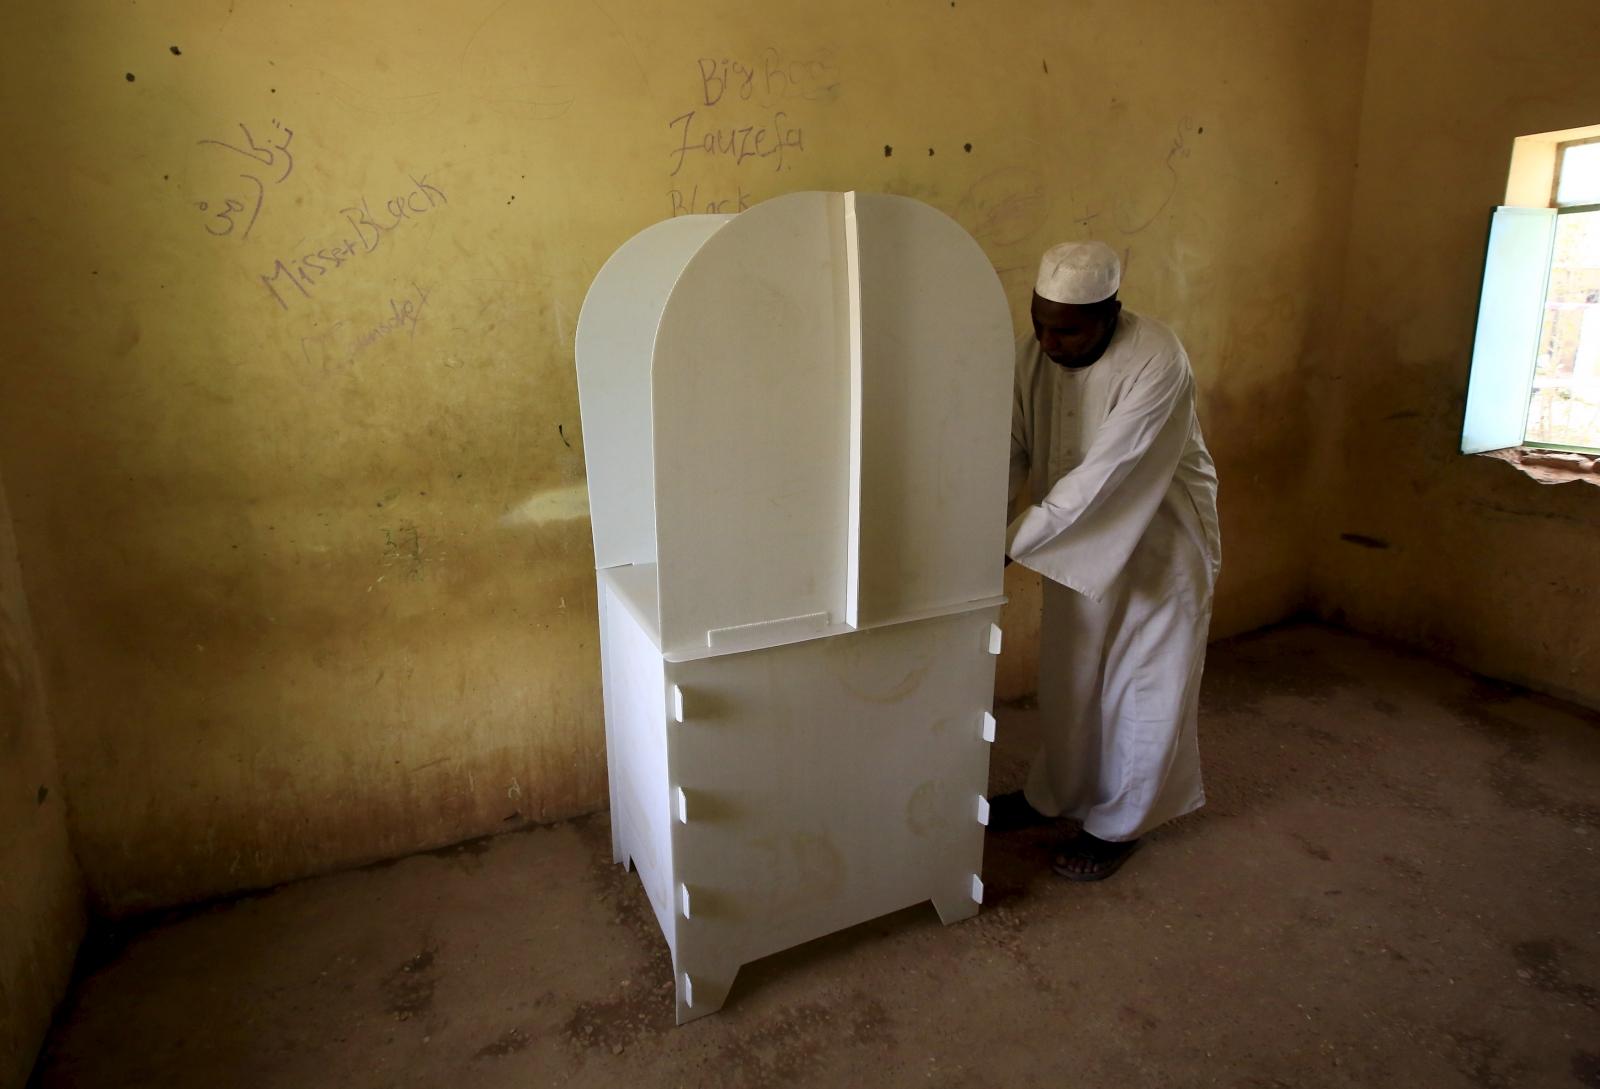 Sudan elections